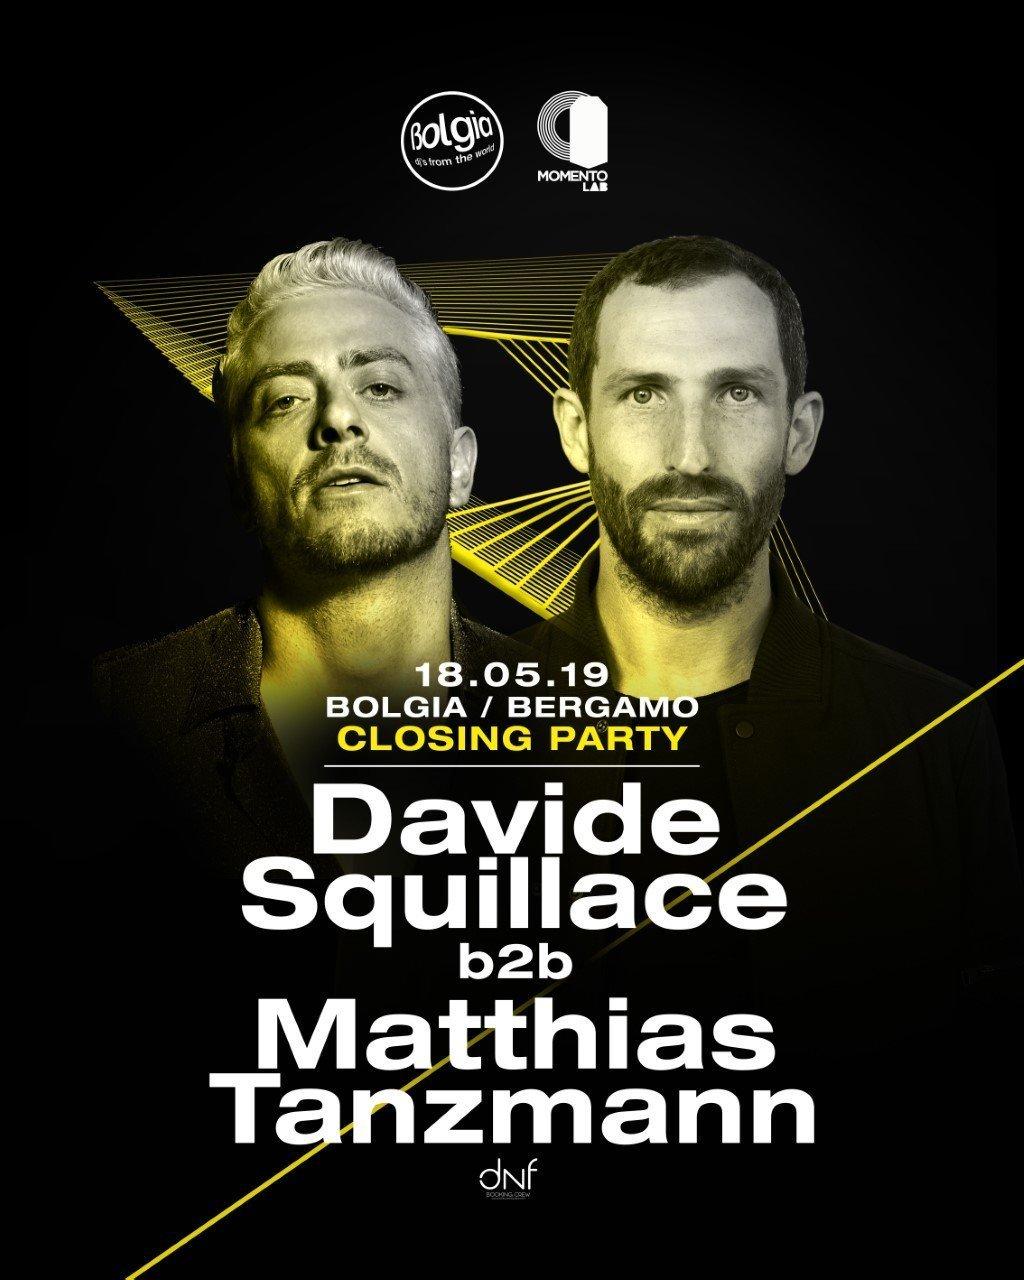 Davide Squillace b2b Matthias Tanzmann @ Bolgia